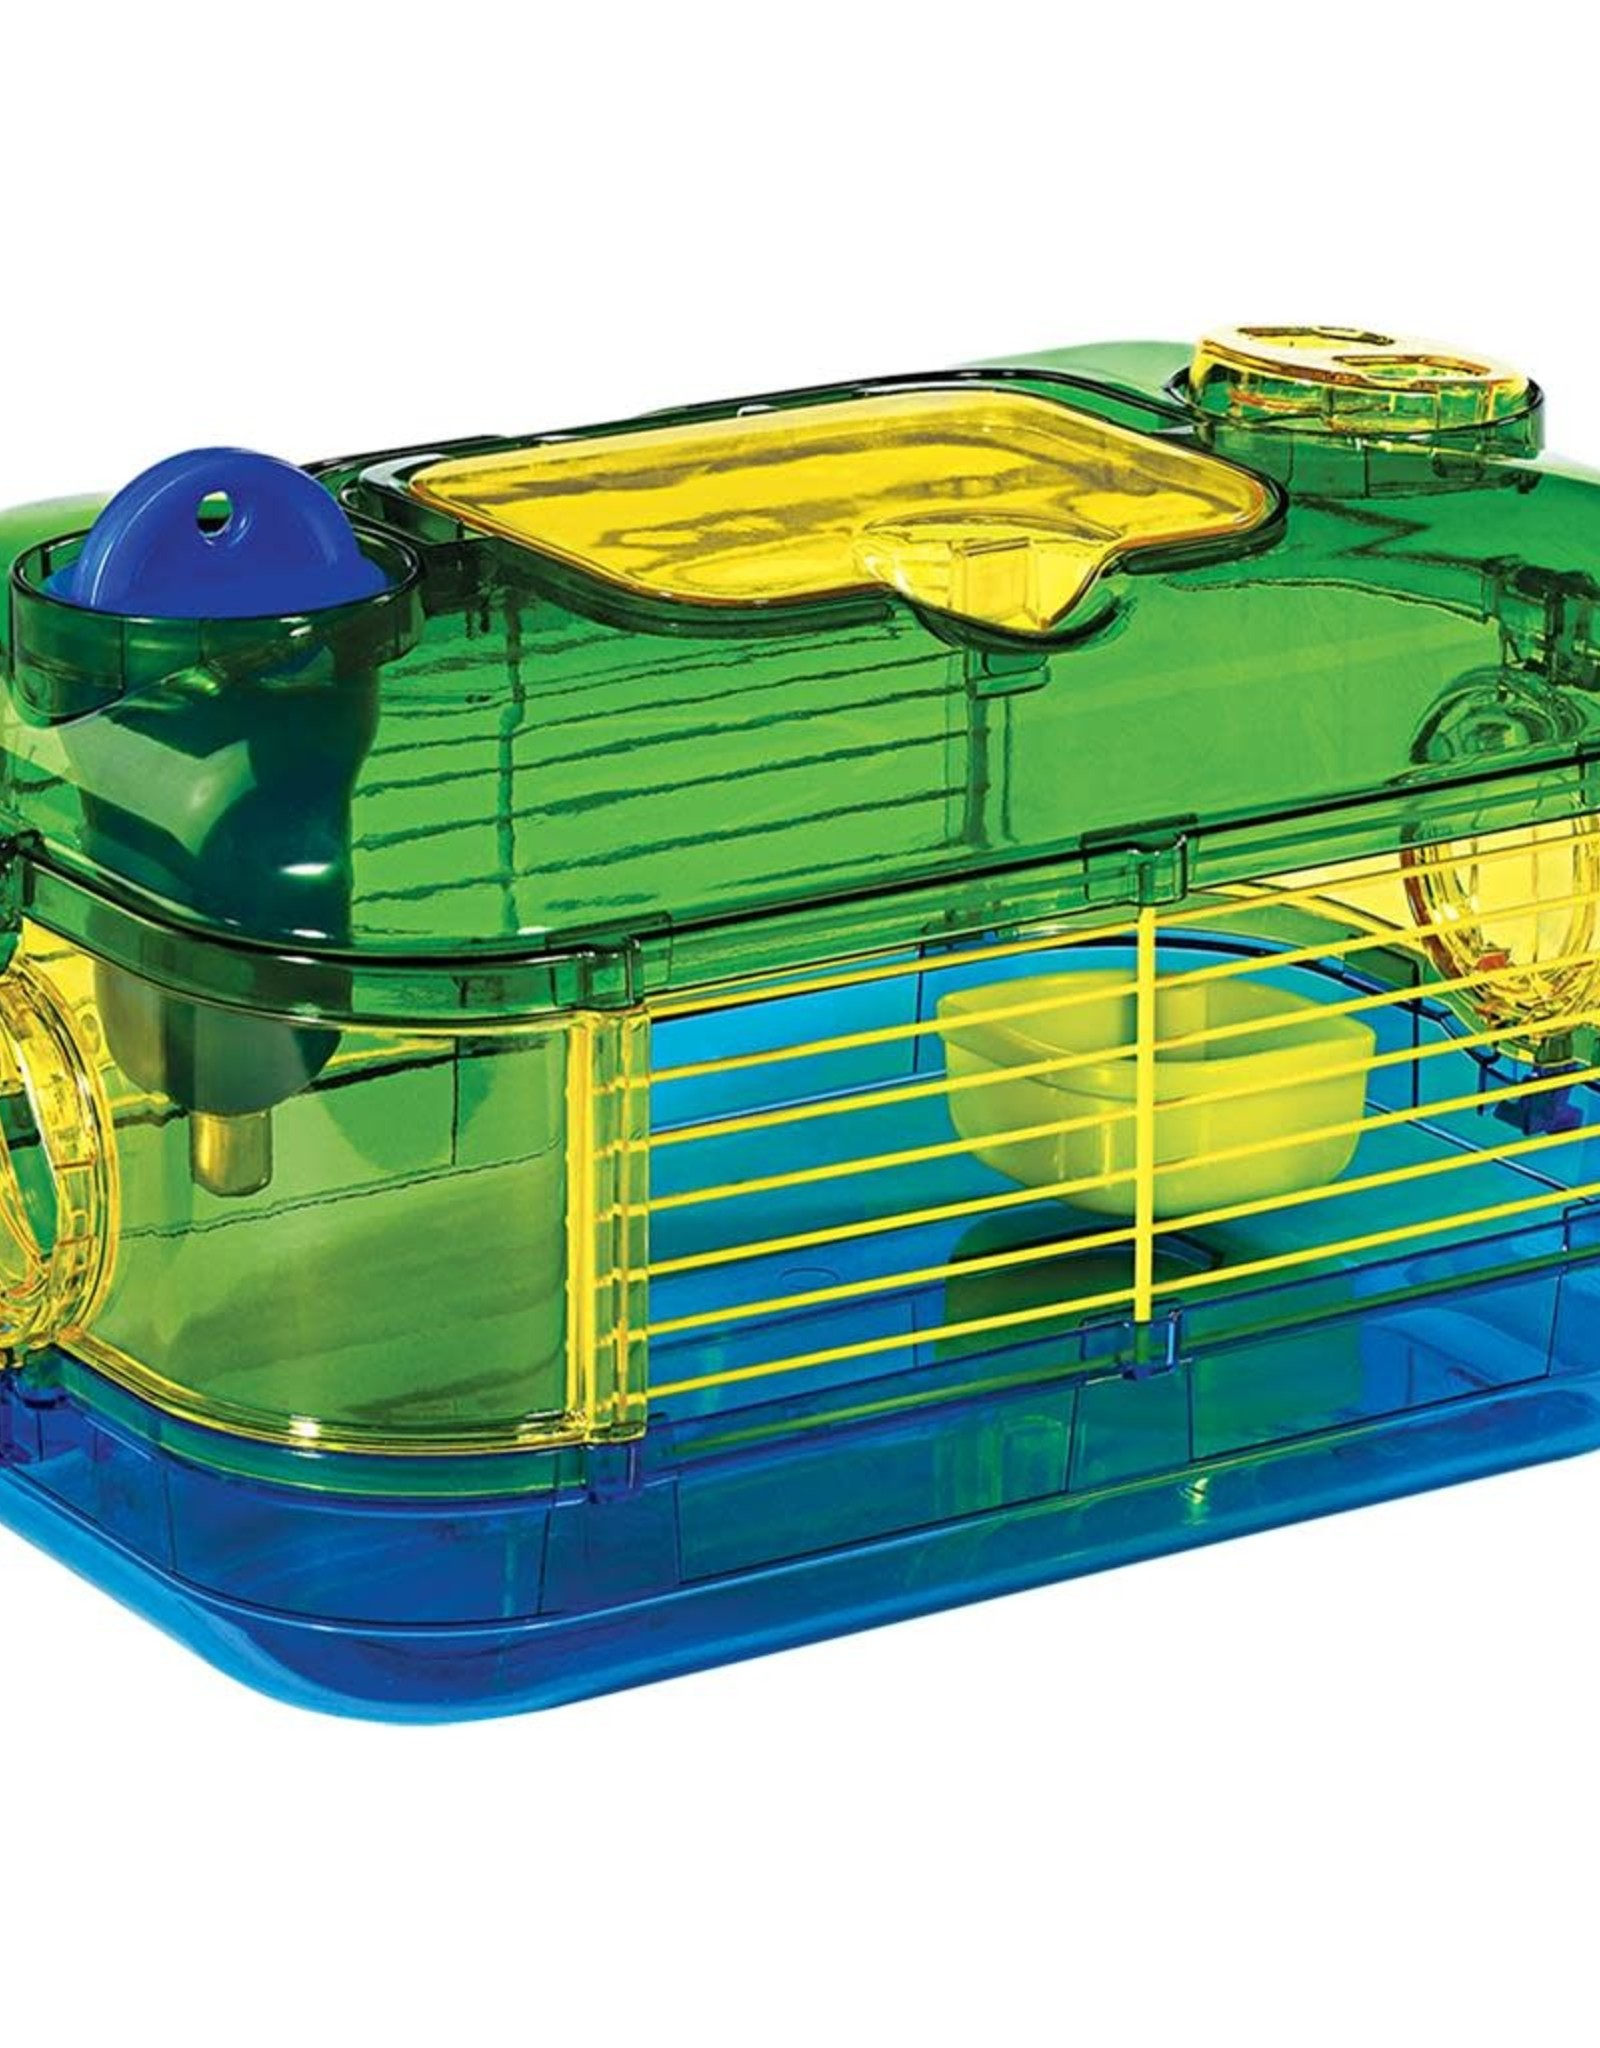 KAYTEE PRODUCTS INC Crittertrail Mini Carry & Go